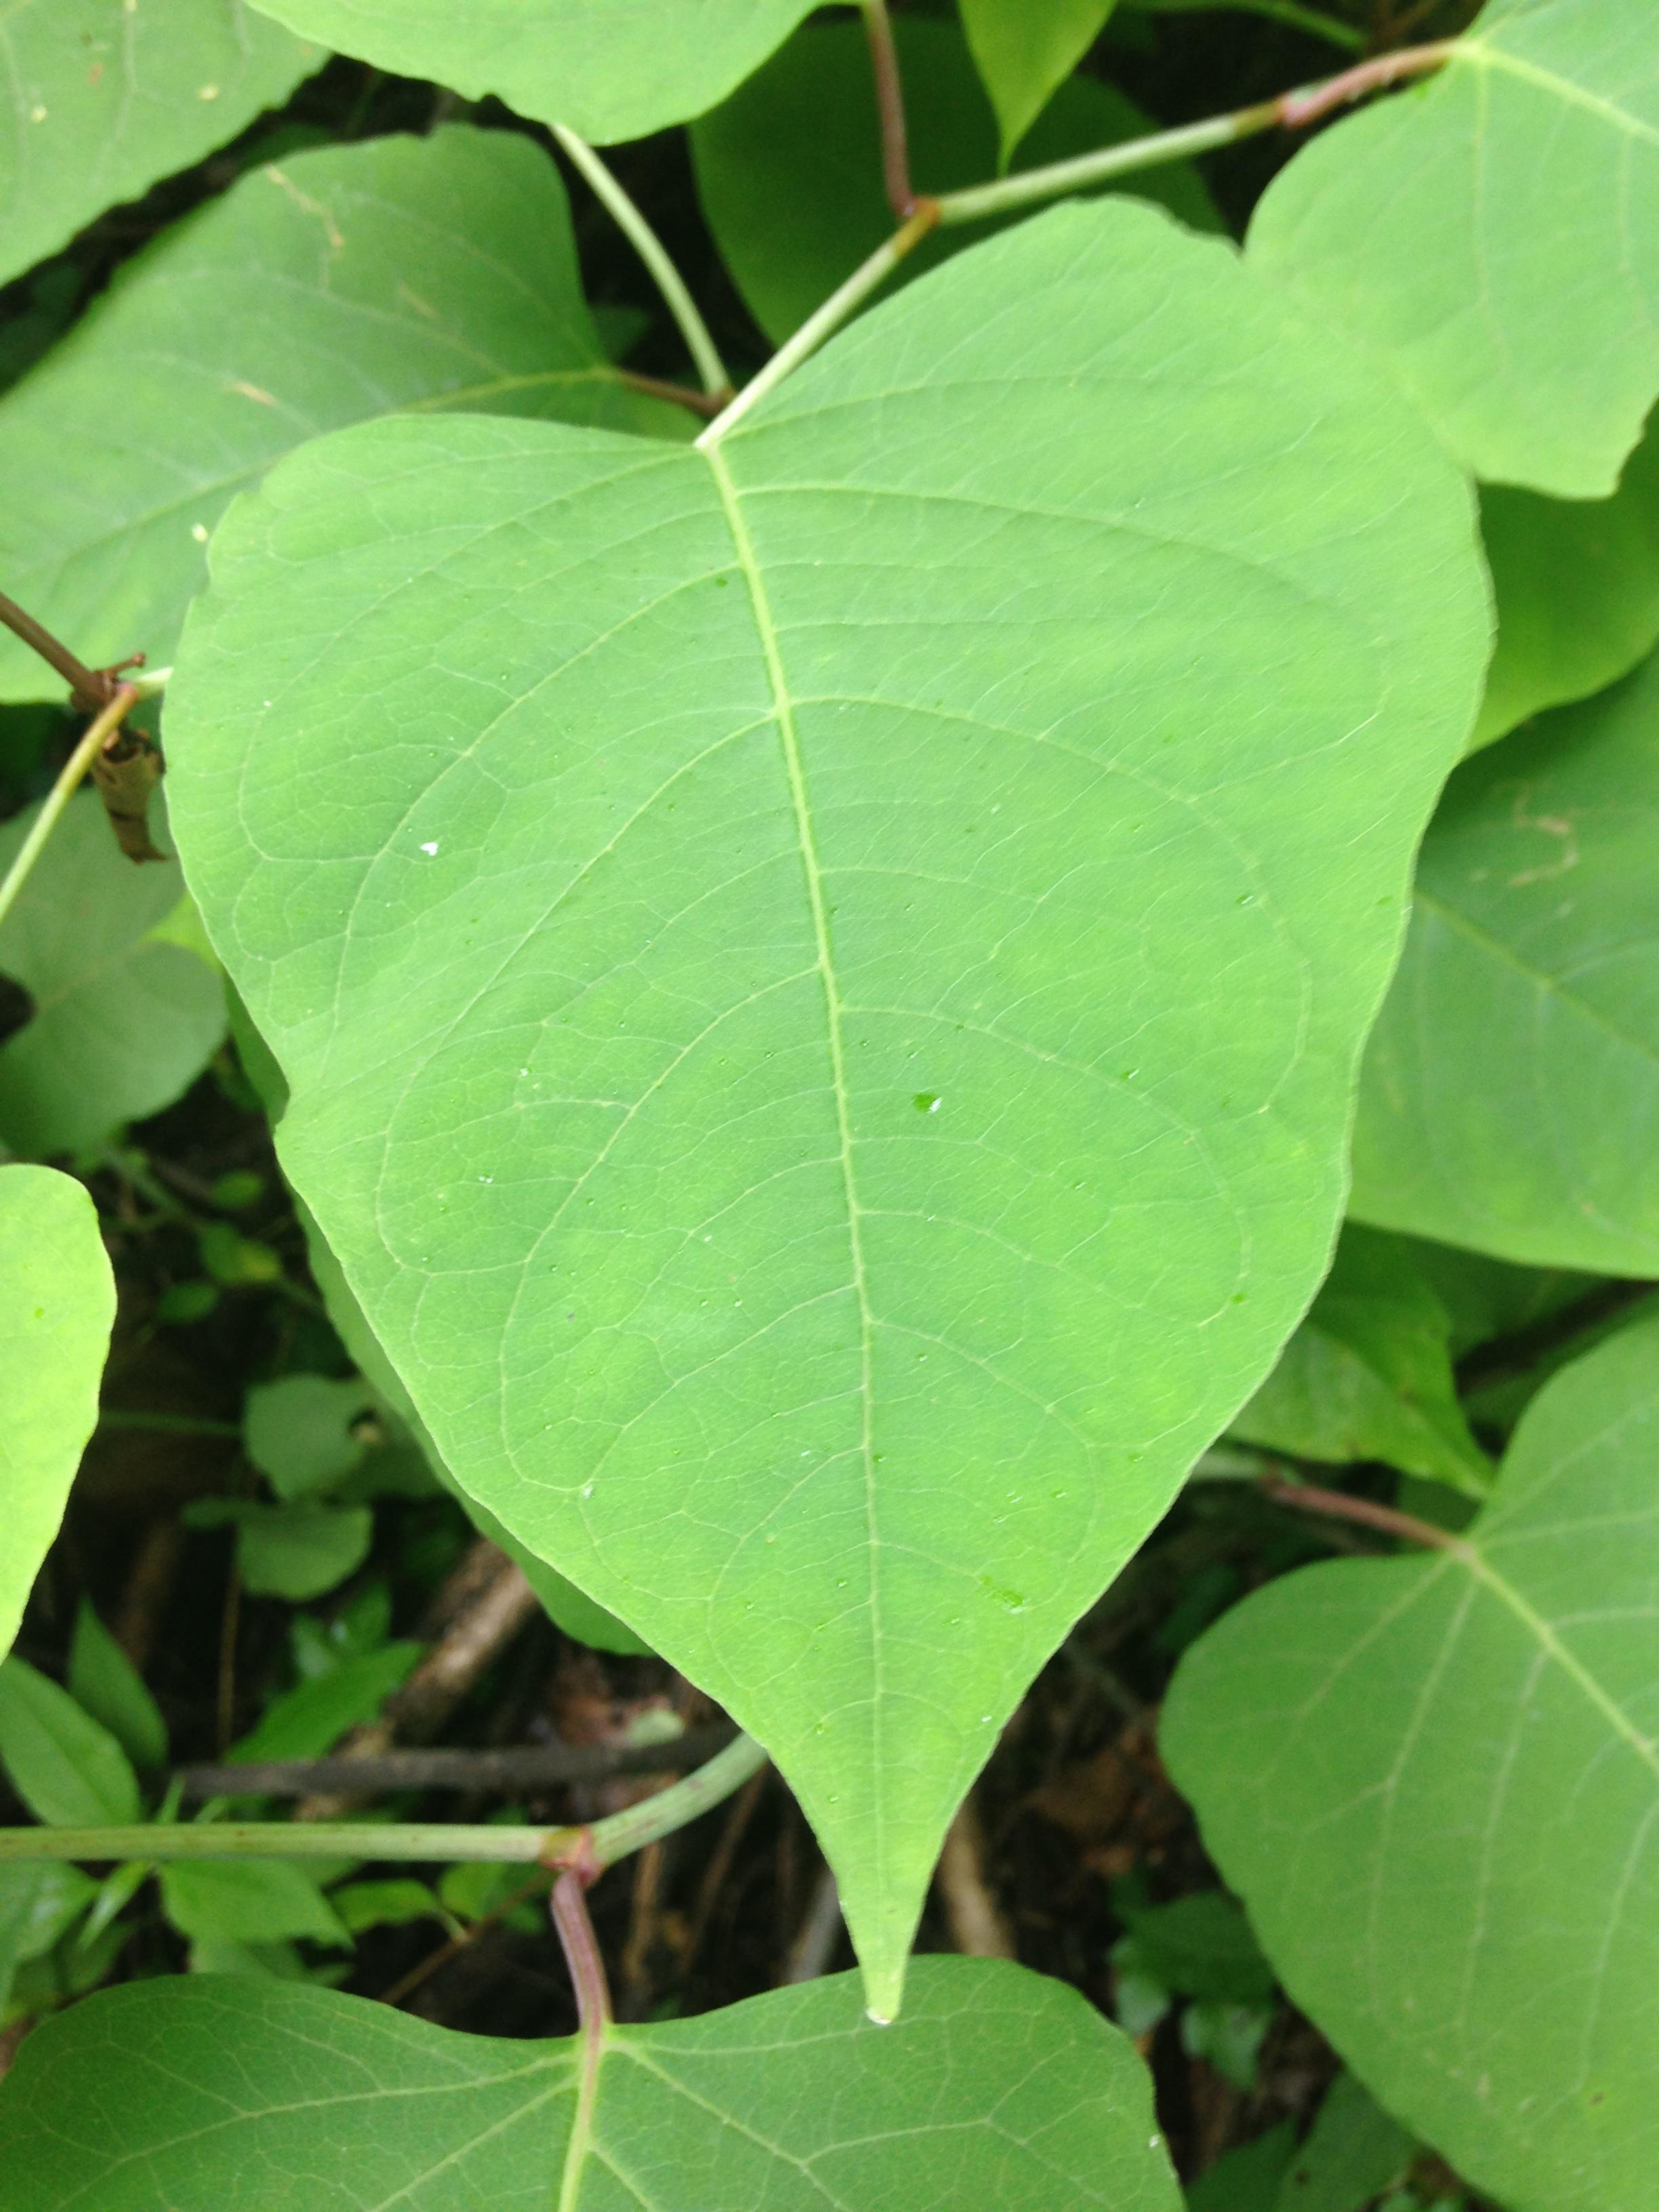 Japanese Knotweed Botany Field Notebook